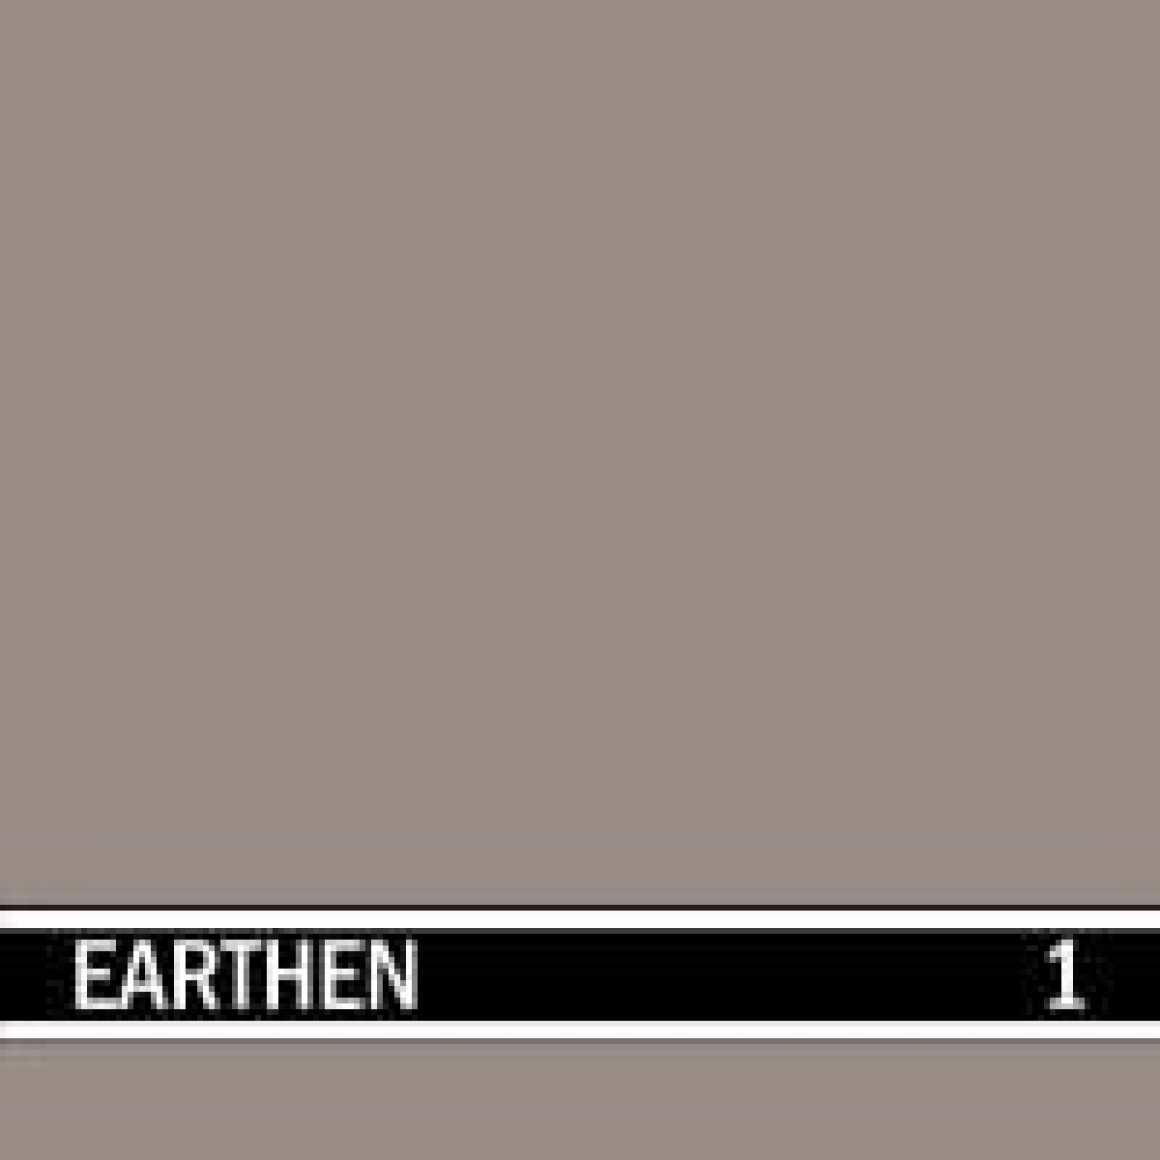 Earthen integral concrete color for stamped concrete and decorative colored concrete